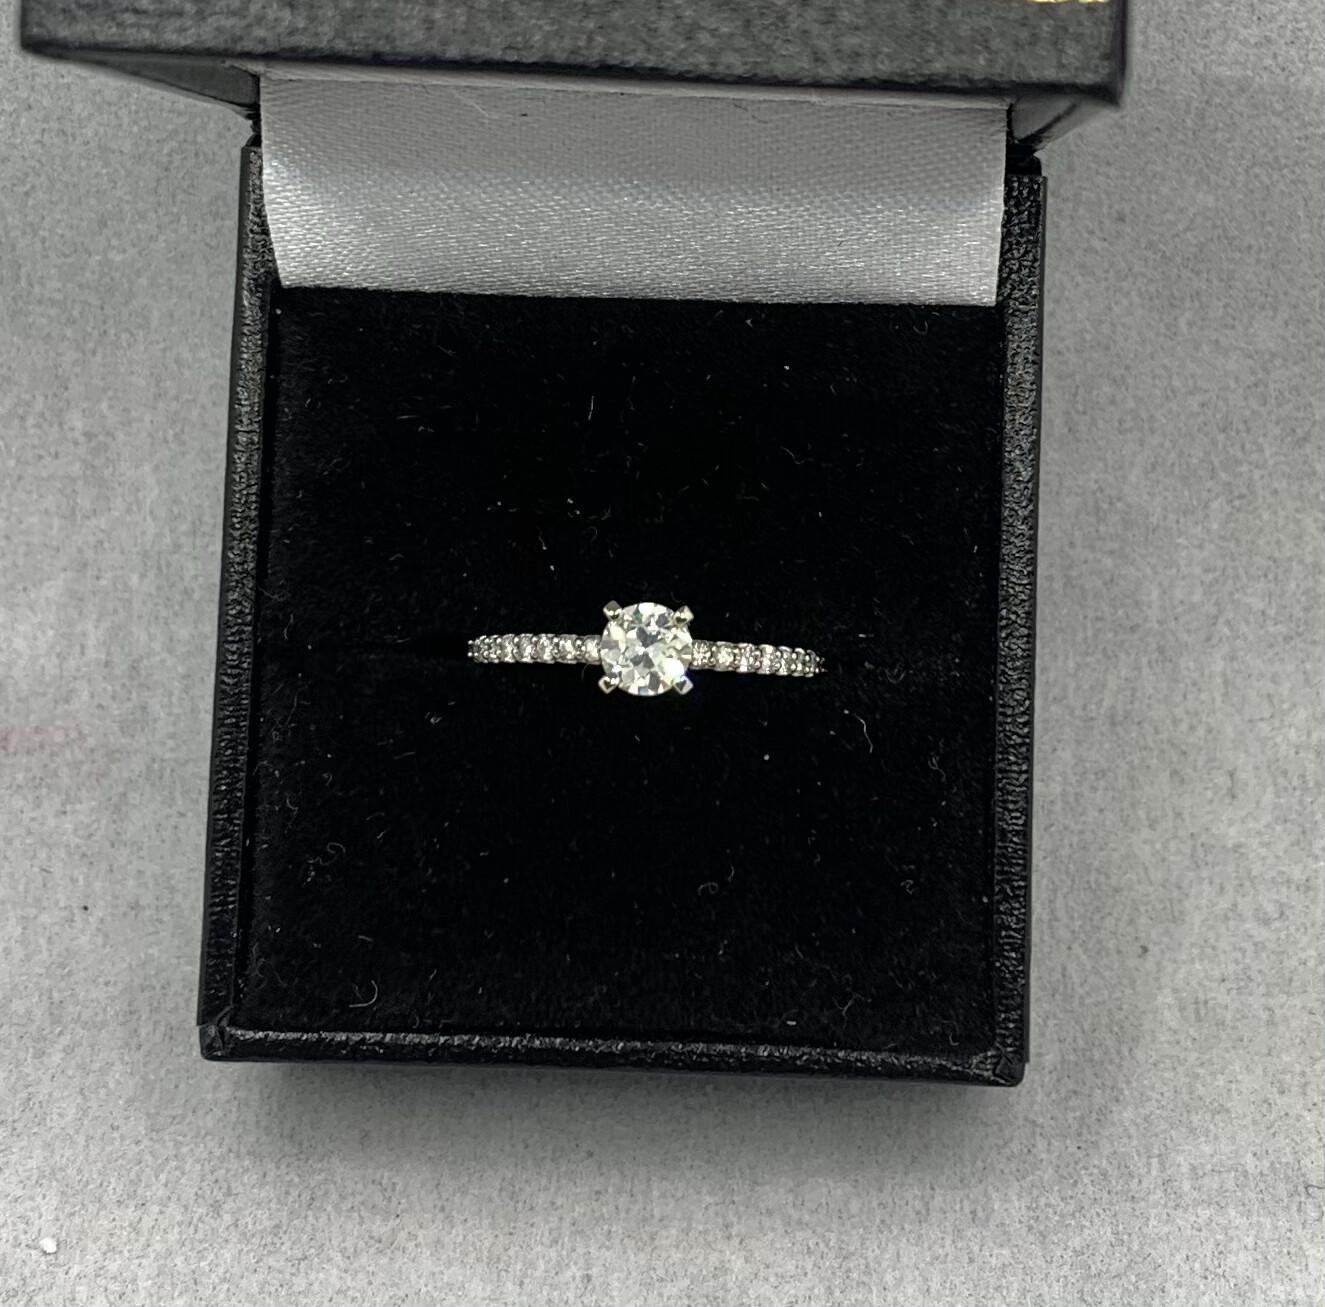 37 Pt Center Brilliant Diamond With 20 Pt Sides. SI2 H